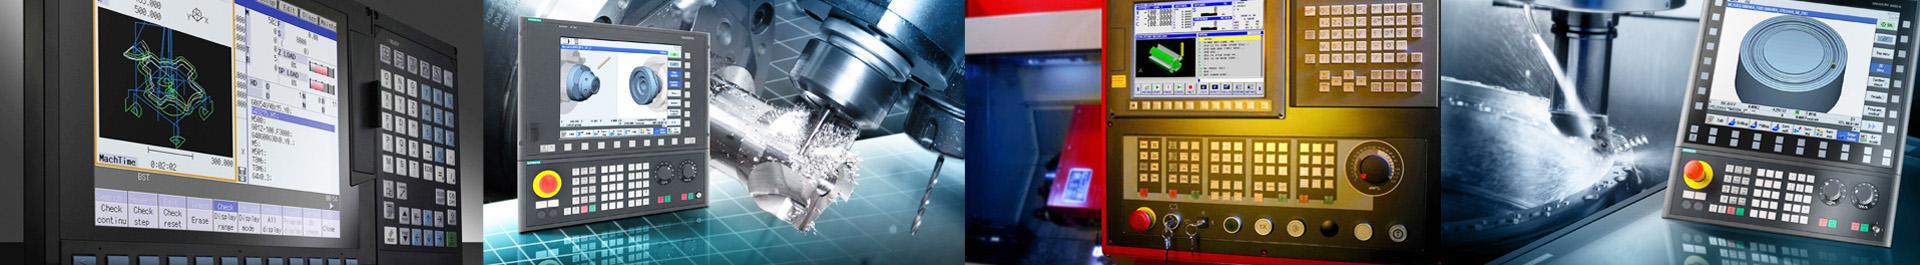 CNC Controls Panel  Siemens & Fanuc  WD Hearn